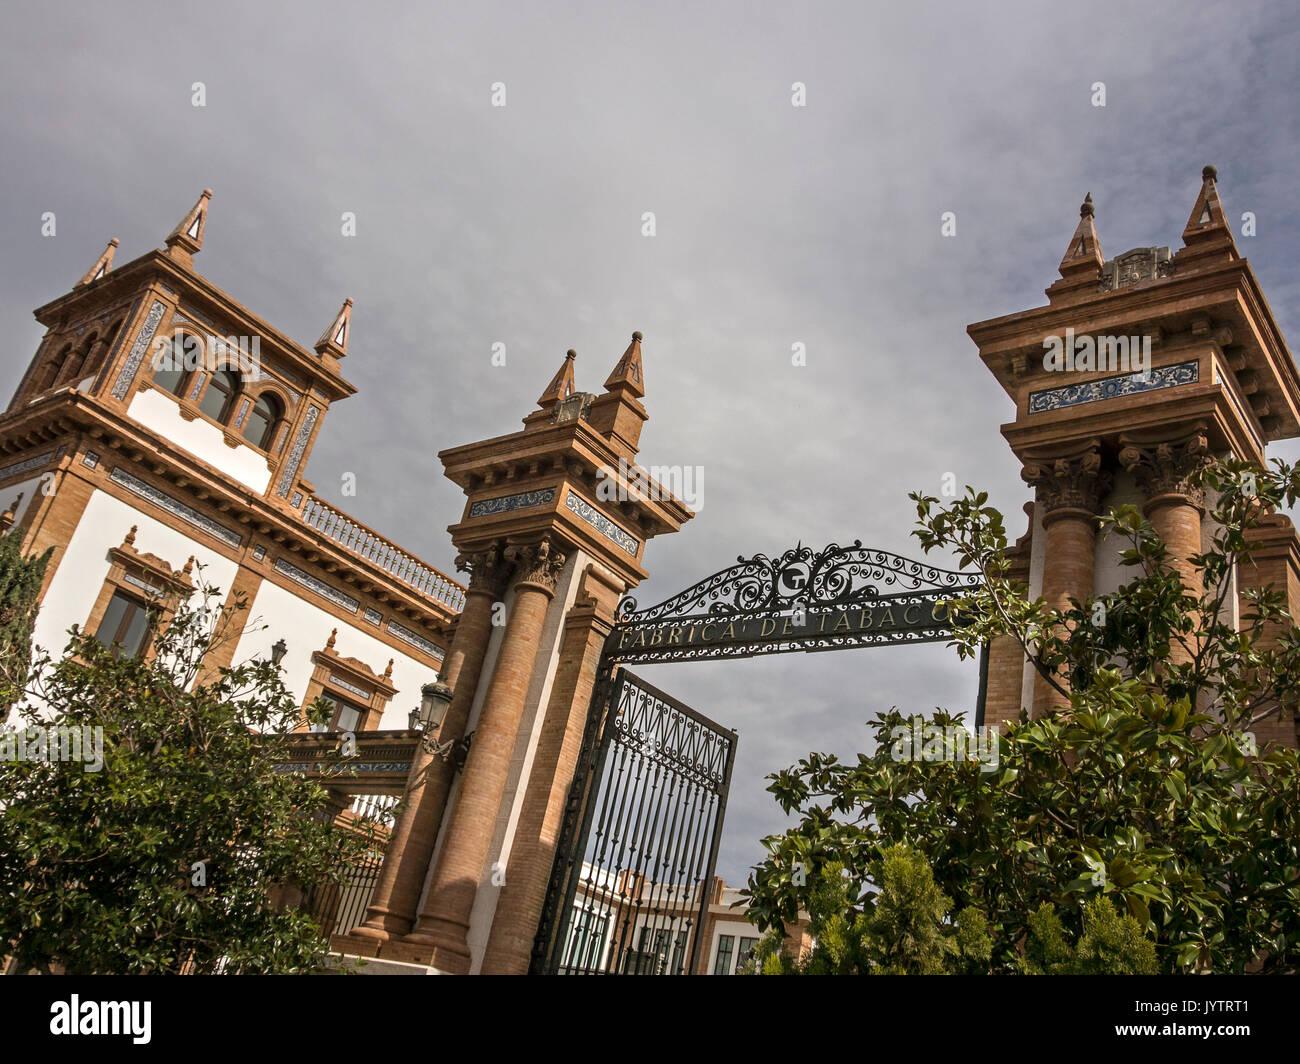 MALAGA, SPAIN: Entrance gates to the Motor Museum - Stock Image